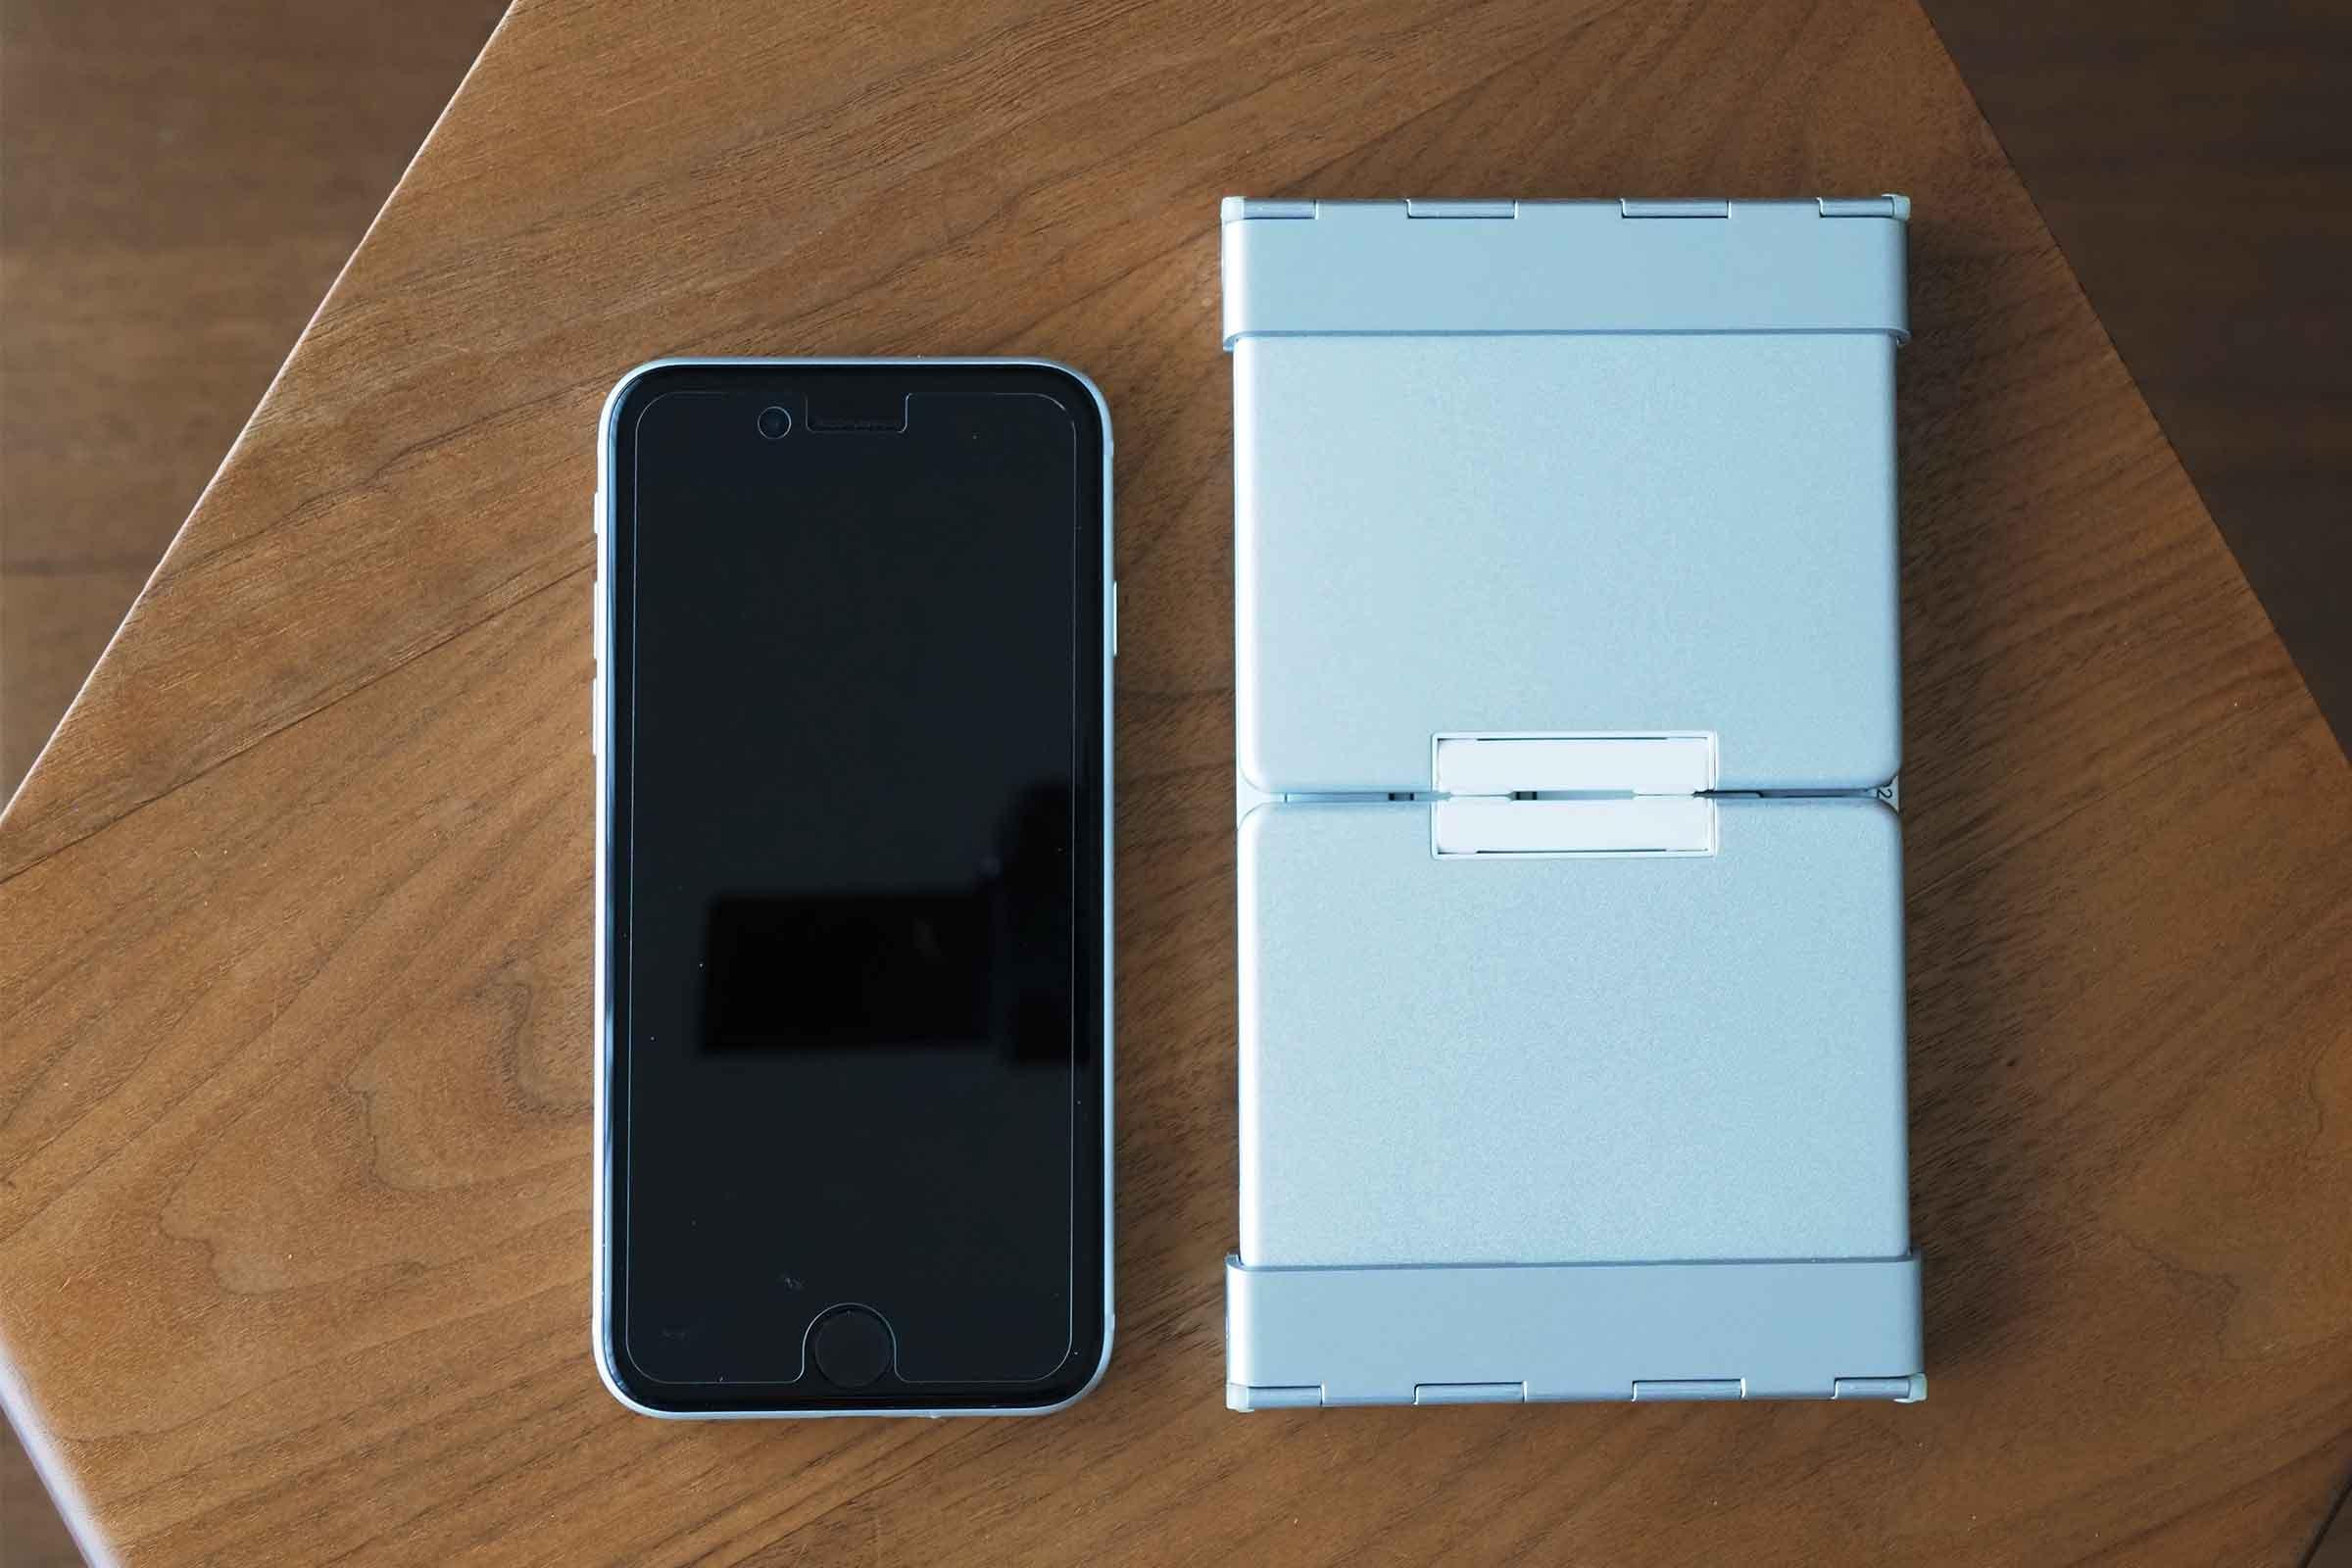 iclever,Bluetoothキーボード,iPad,iPad mini,コンパクト,薄い,安い,タッチパッド,軽い